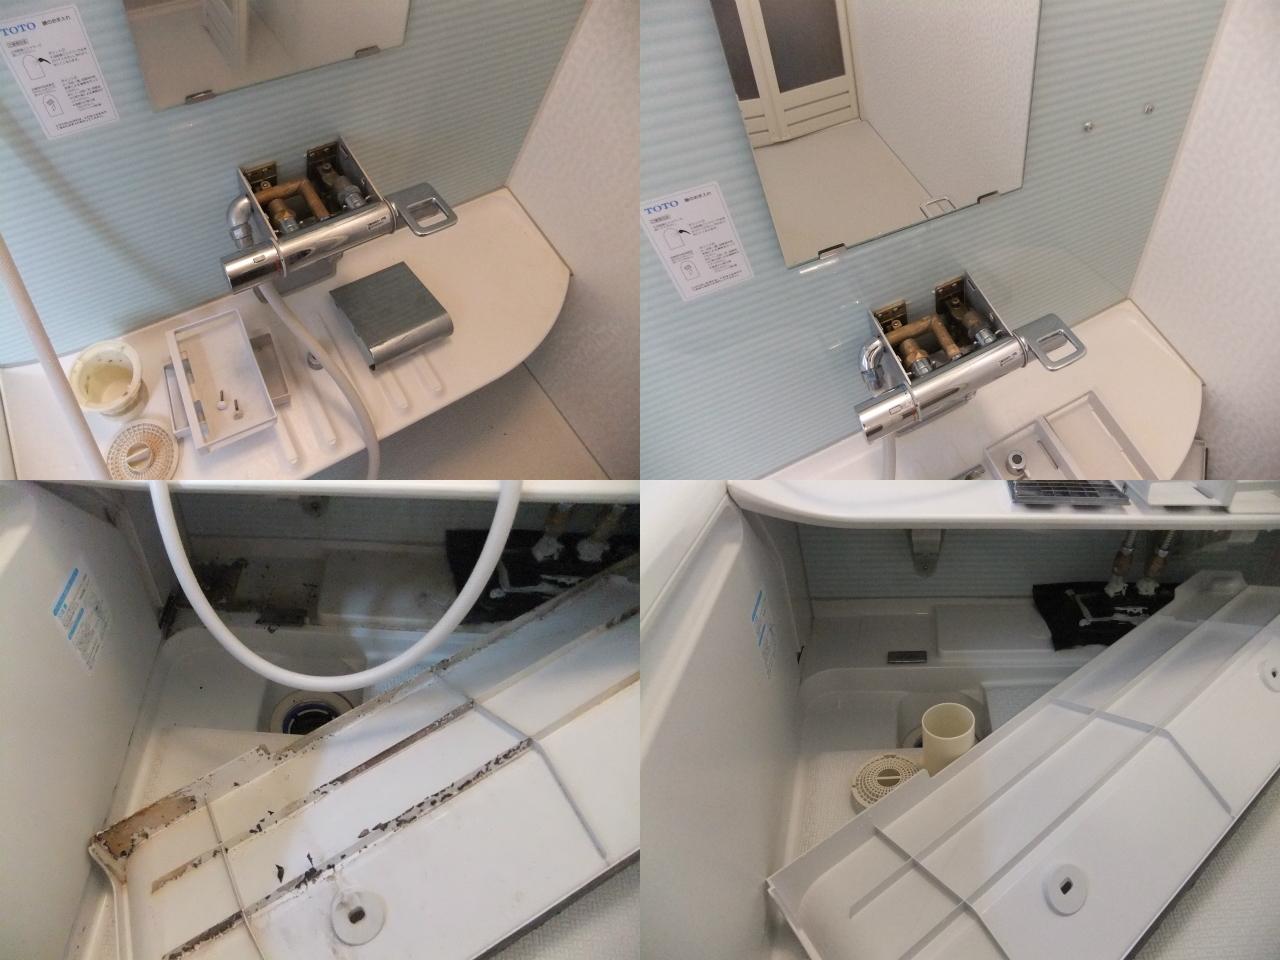 http://ajras.net/images/110915-bathroom1.jpg